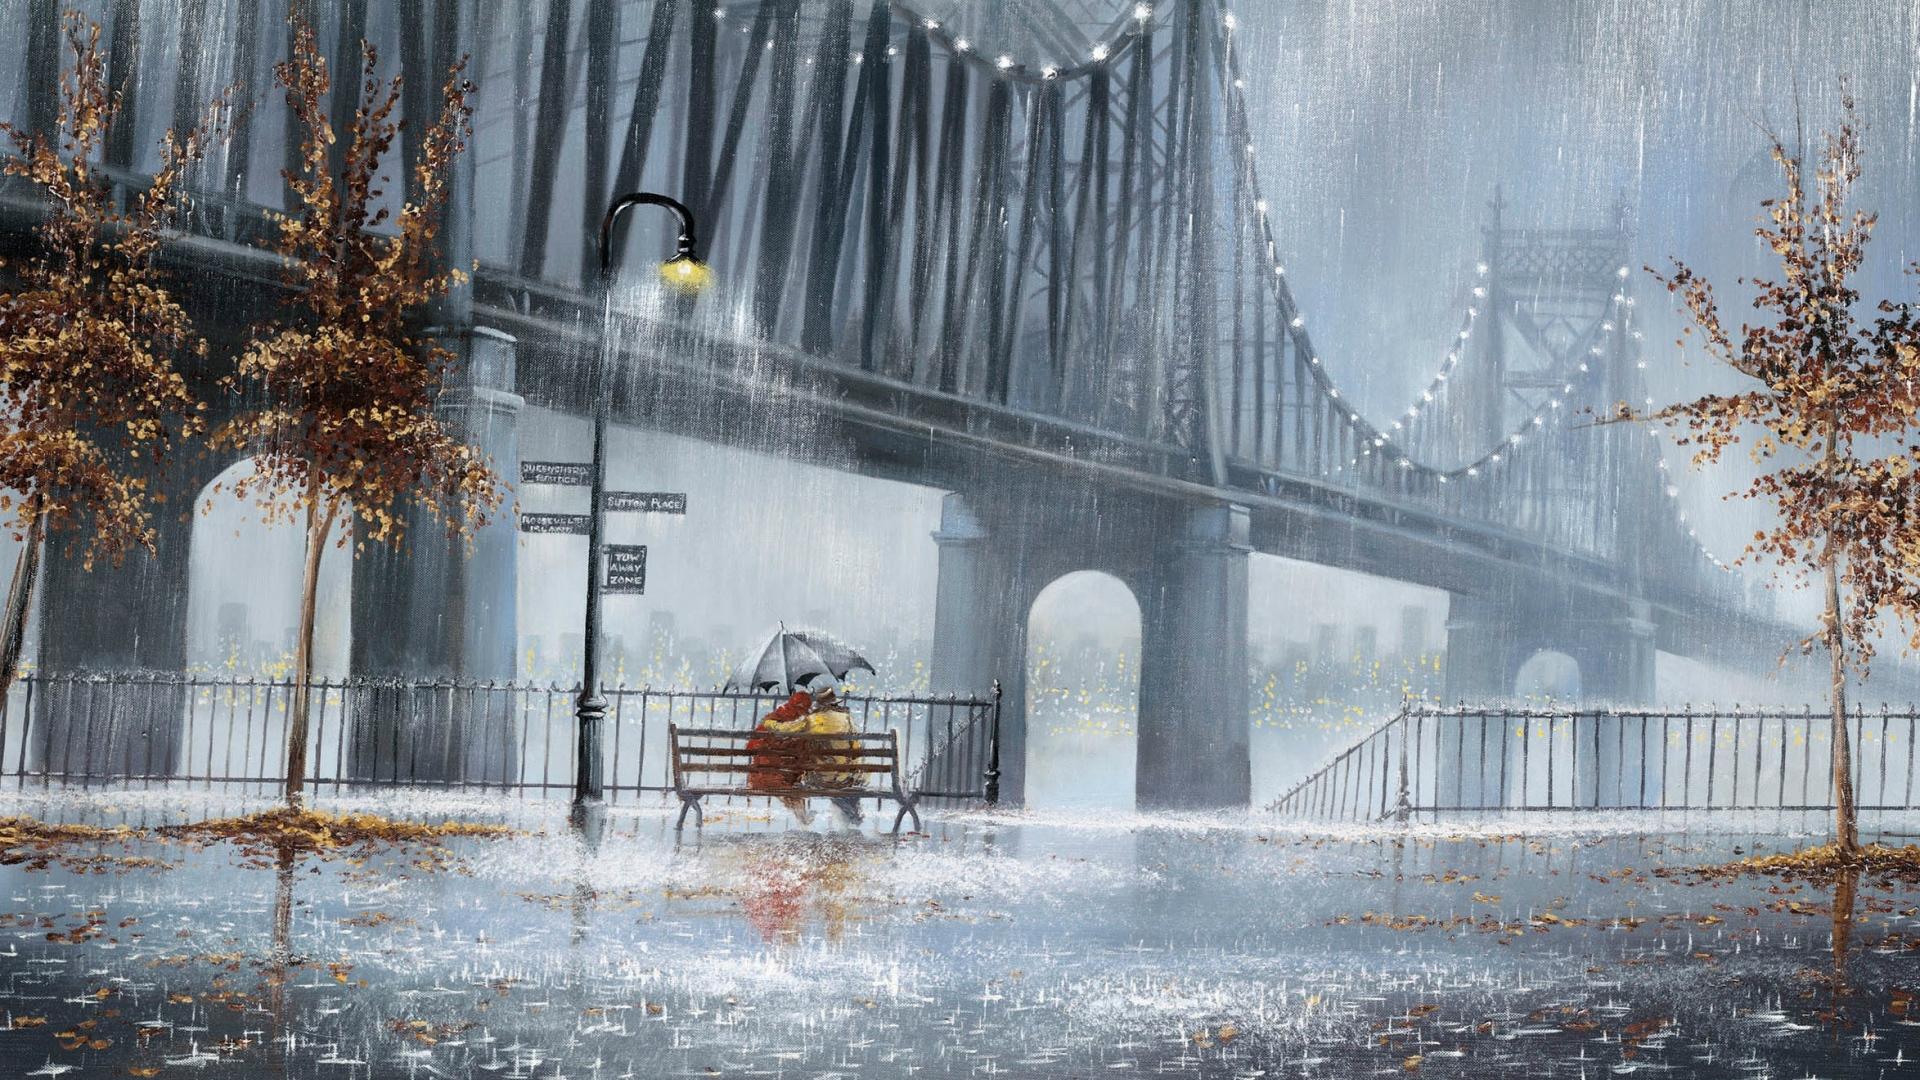 Beautiful-Rain-for-your-desktop-wallpaper-wpc580161